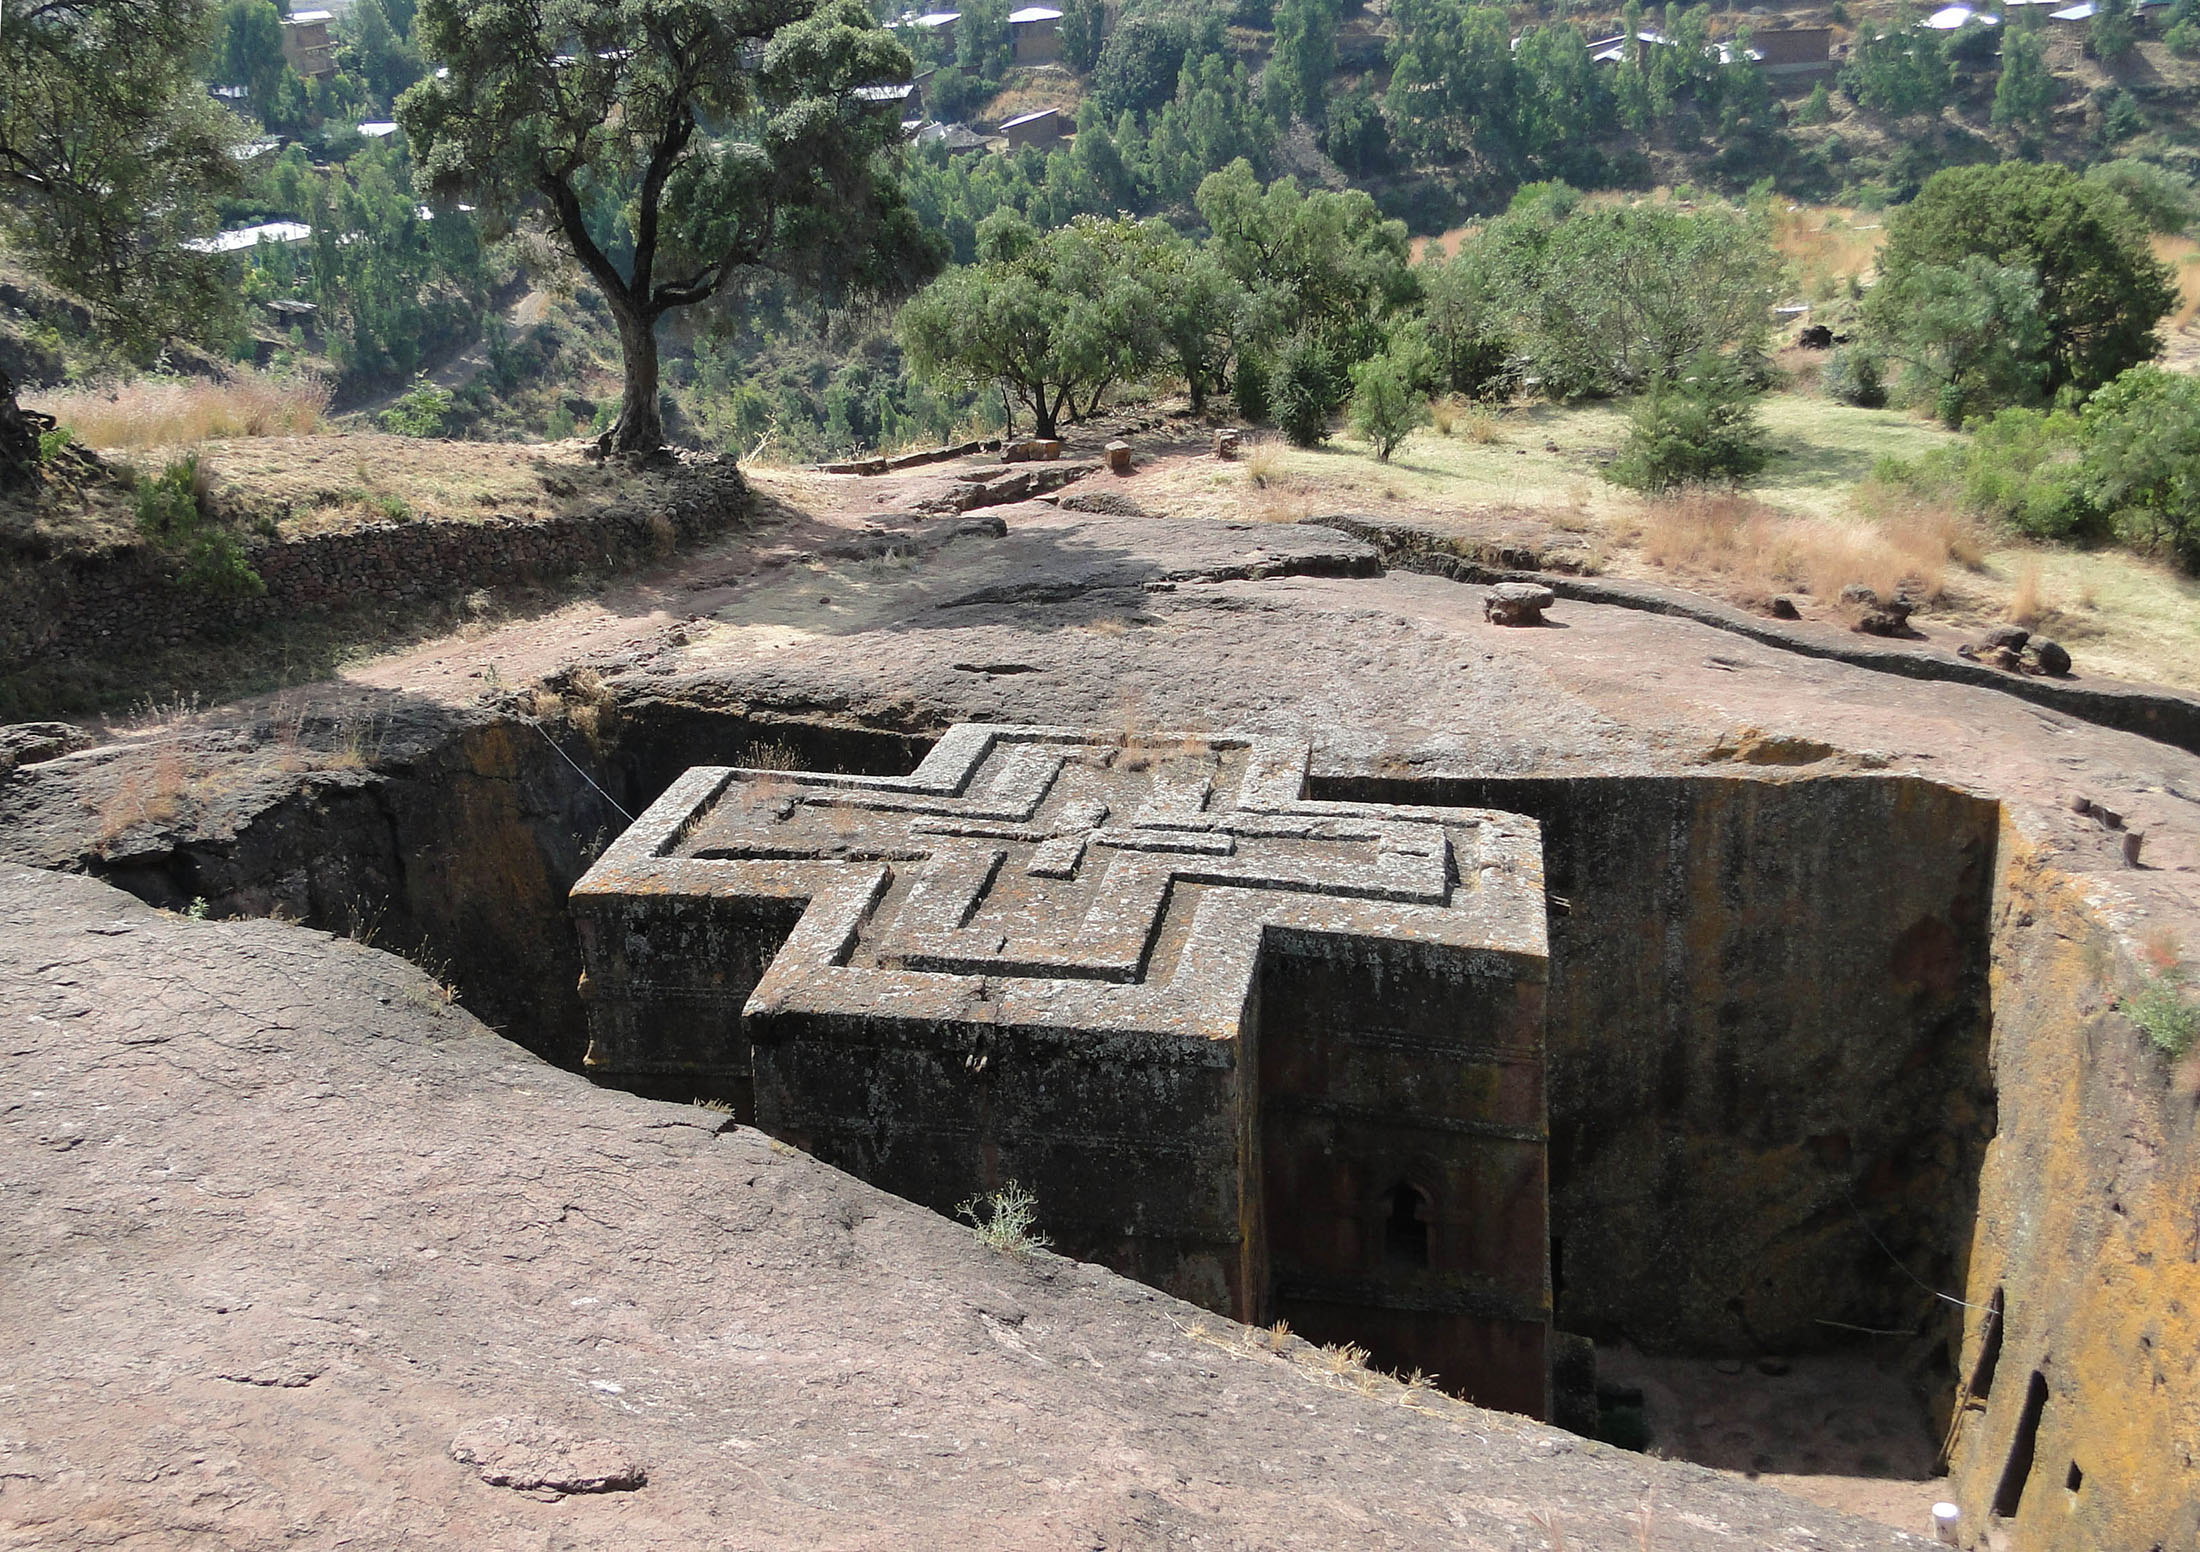 ETHIOPIA - Brodynt Internet access